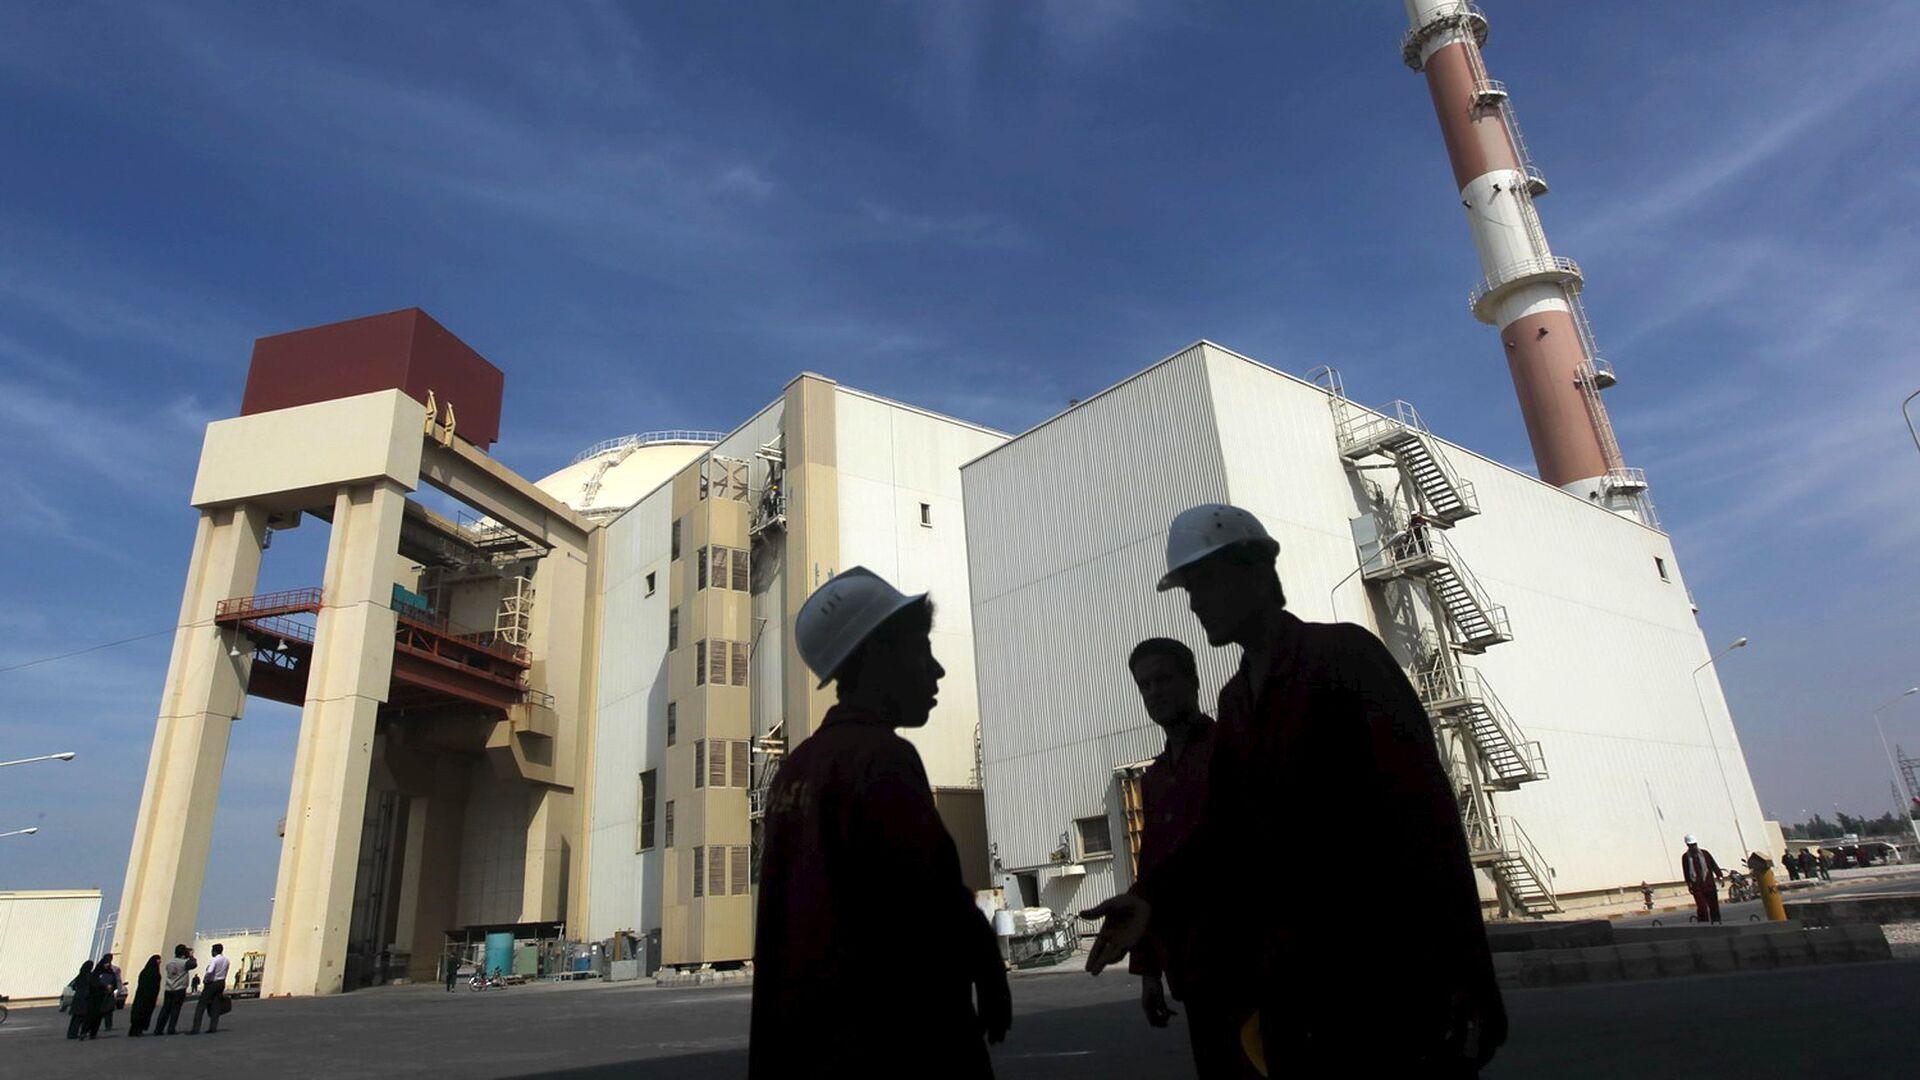 La central nuclear de Bushehr en Irán - Sputnik Mundo, 1920, 29.03.2021